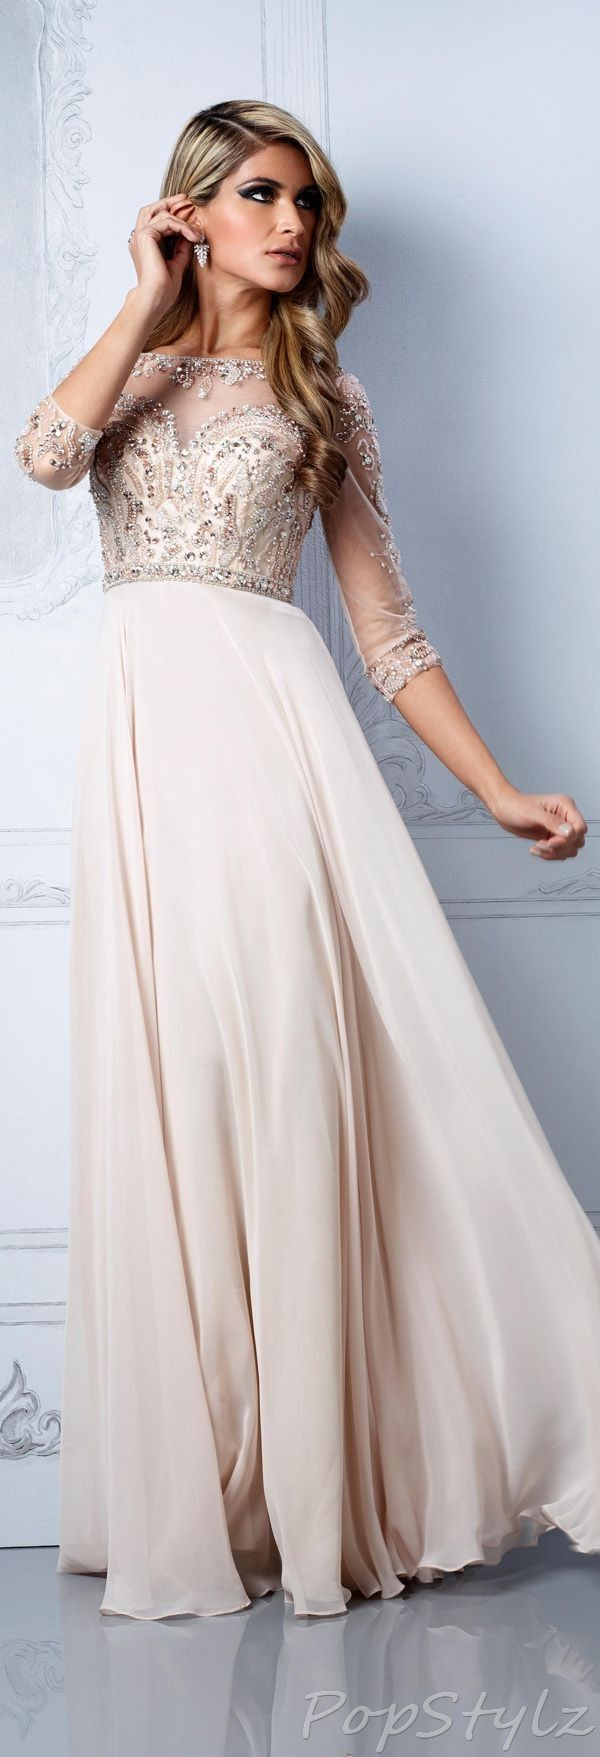 Stunning dress find more women fashion ideas on prom dress #promdress